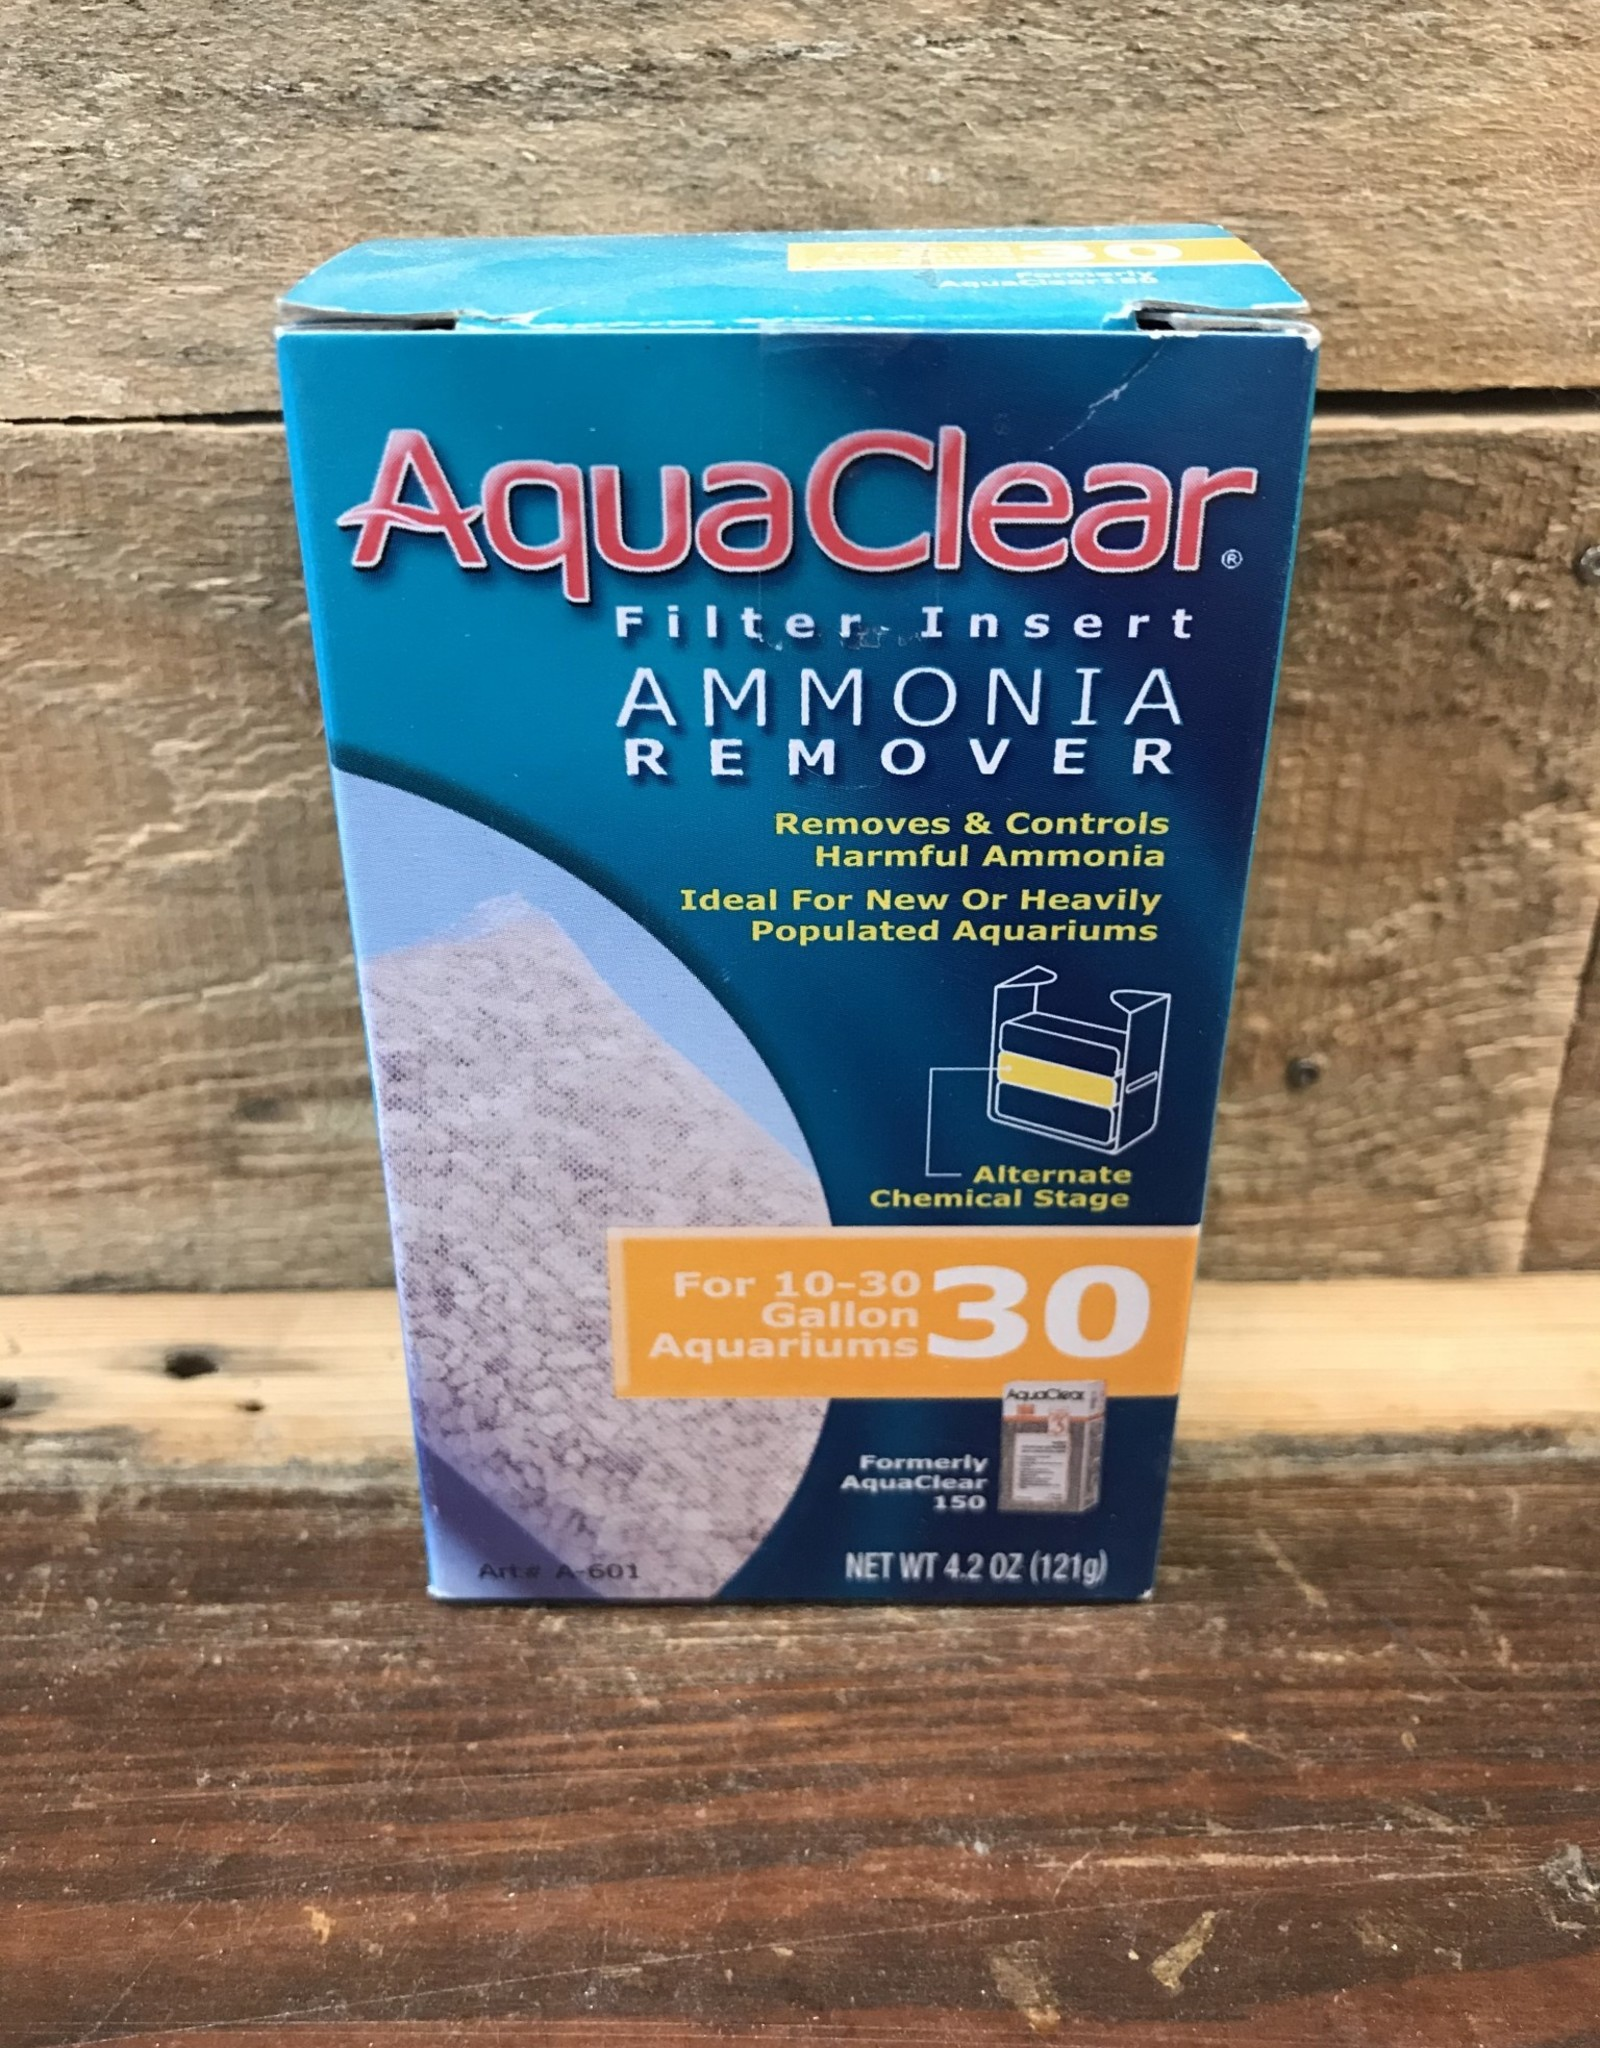 Hagen AquaClear 30 Ammonia Remover, 3 7/8 oz